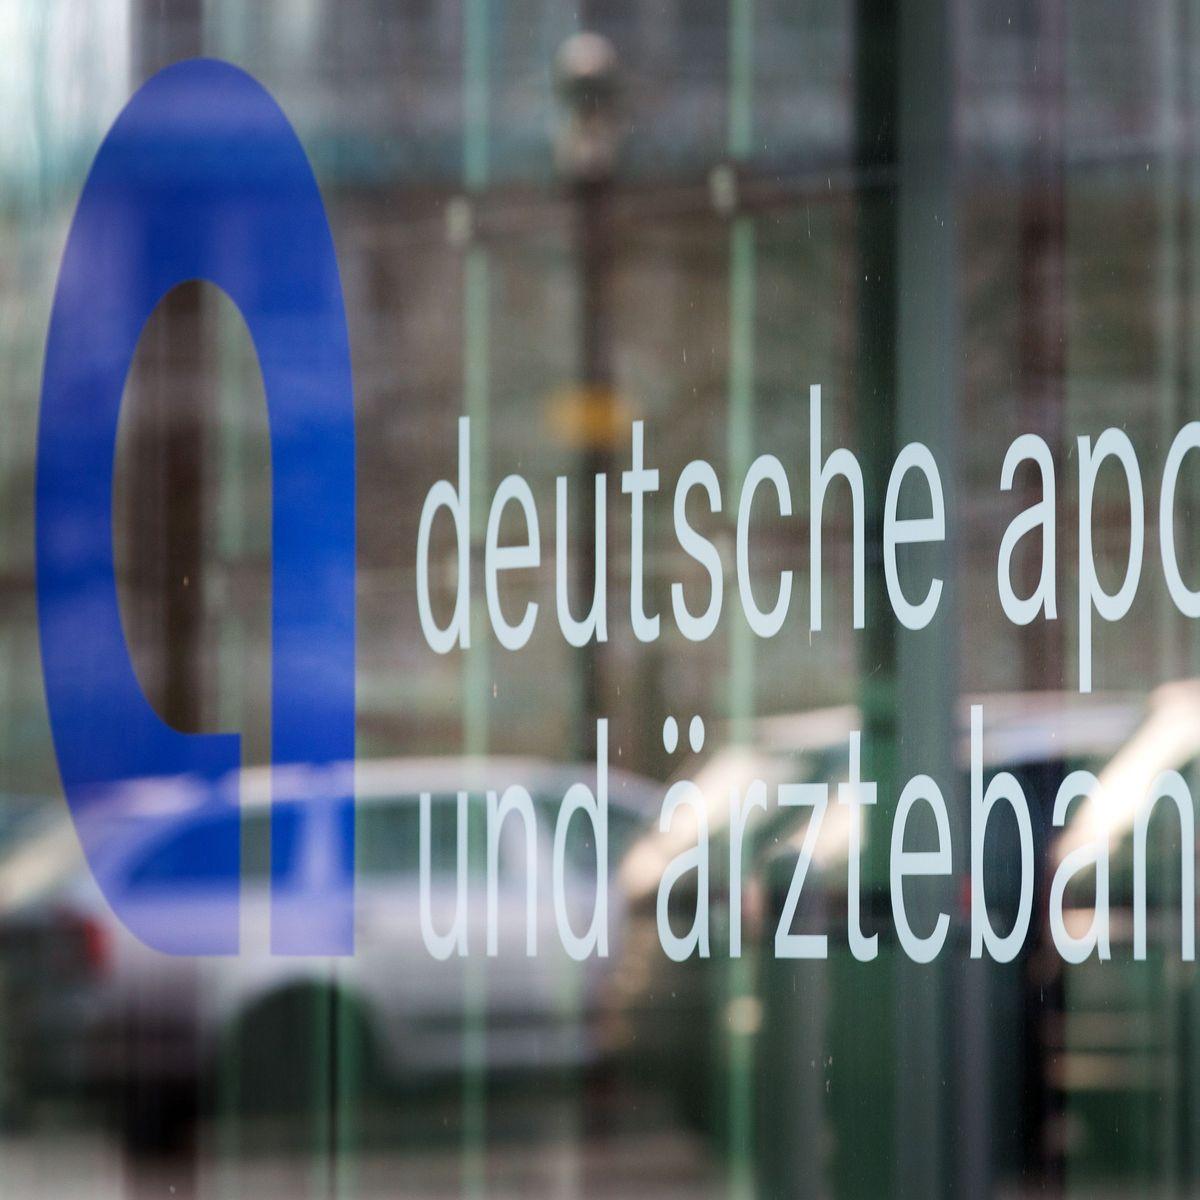 apobank online banking